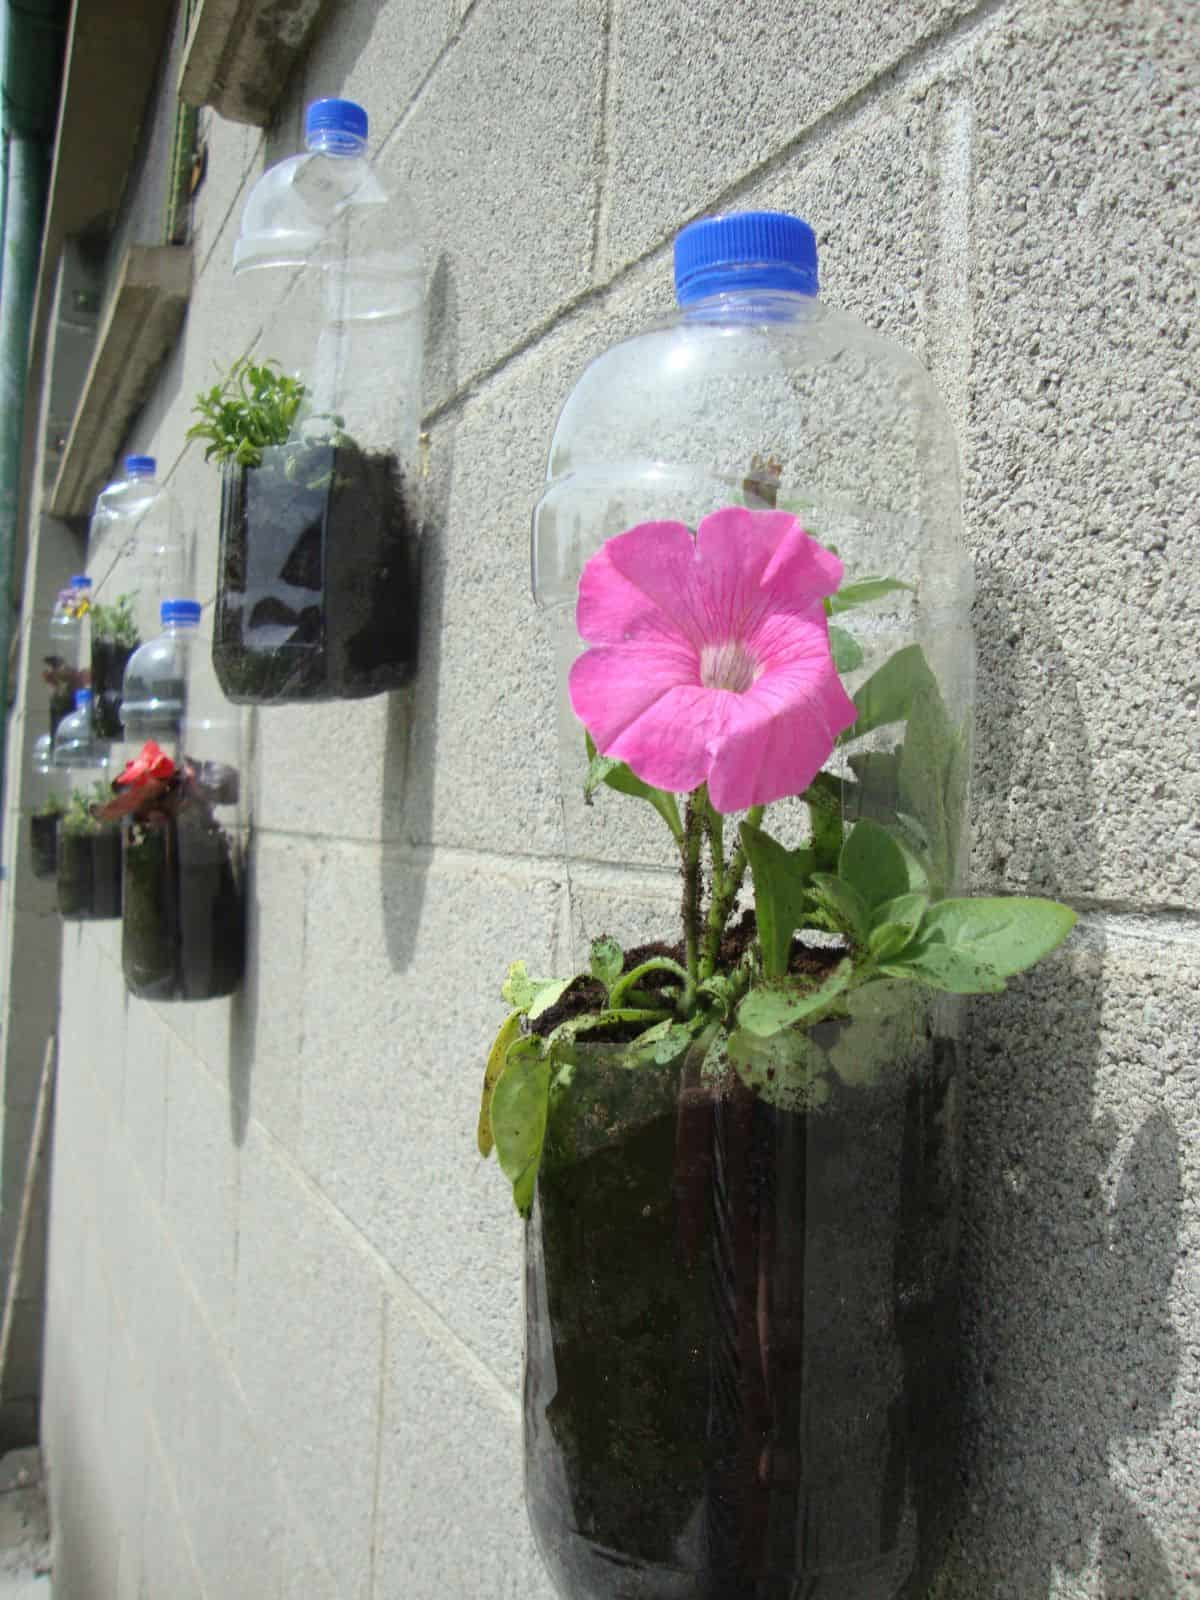 Hanging plastic bottles